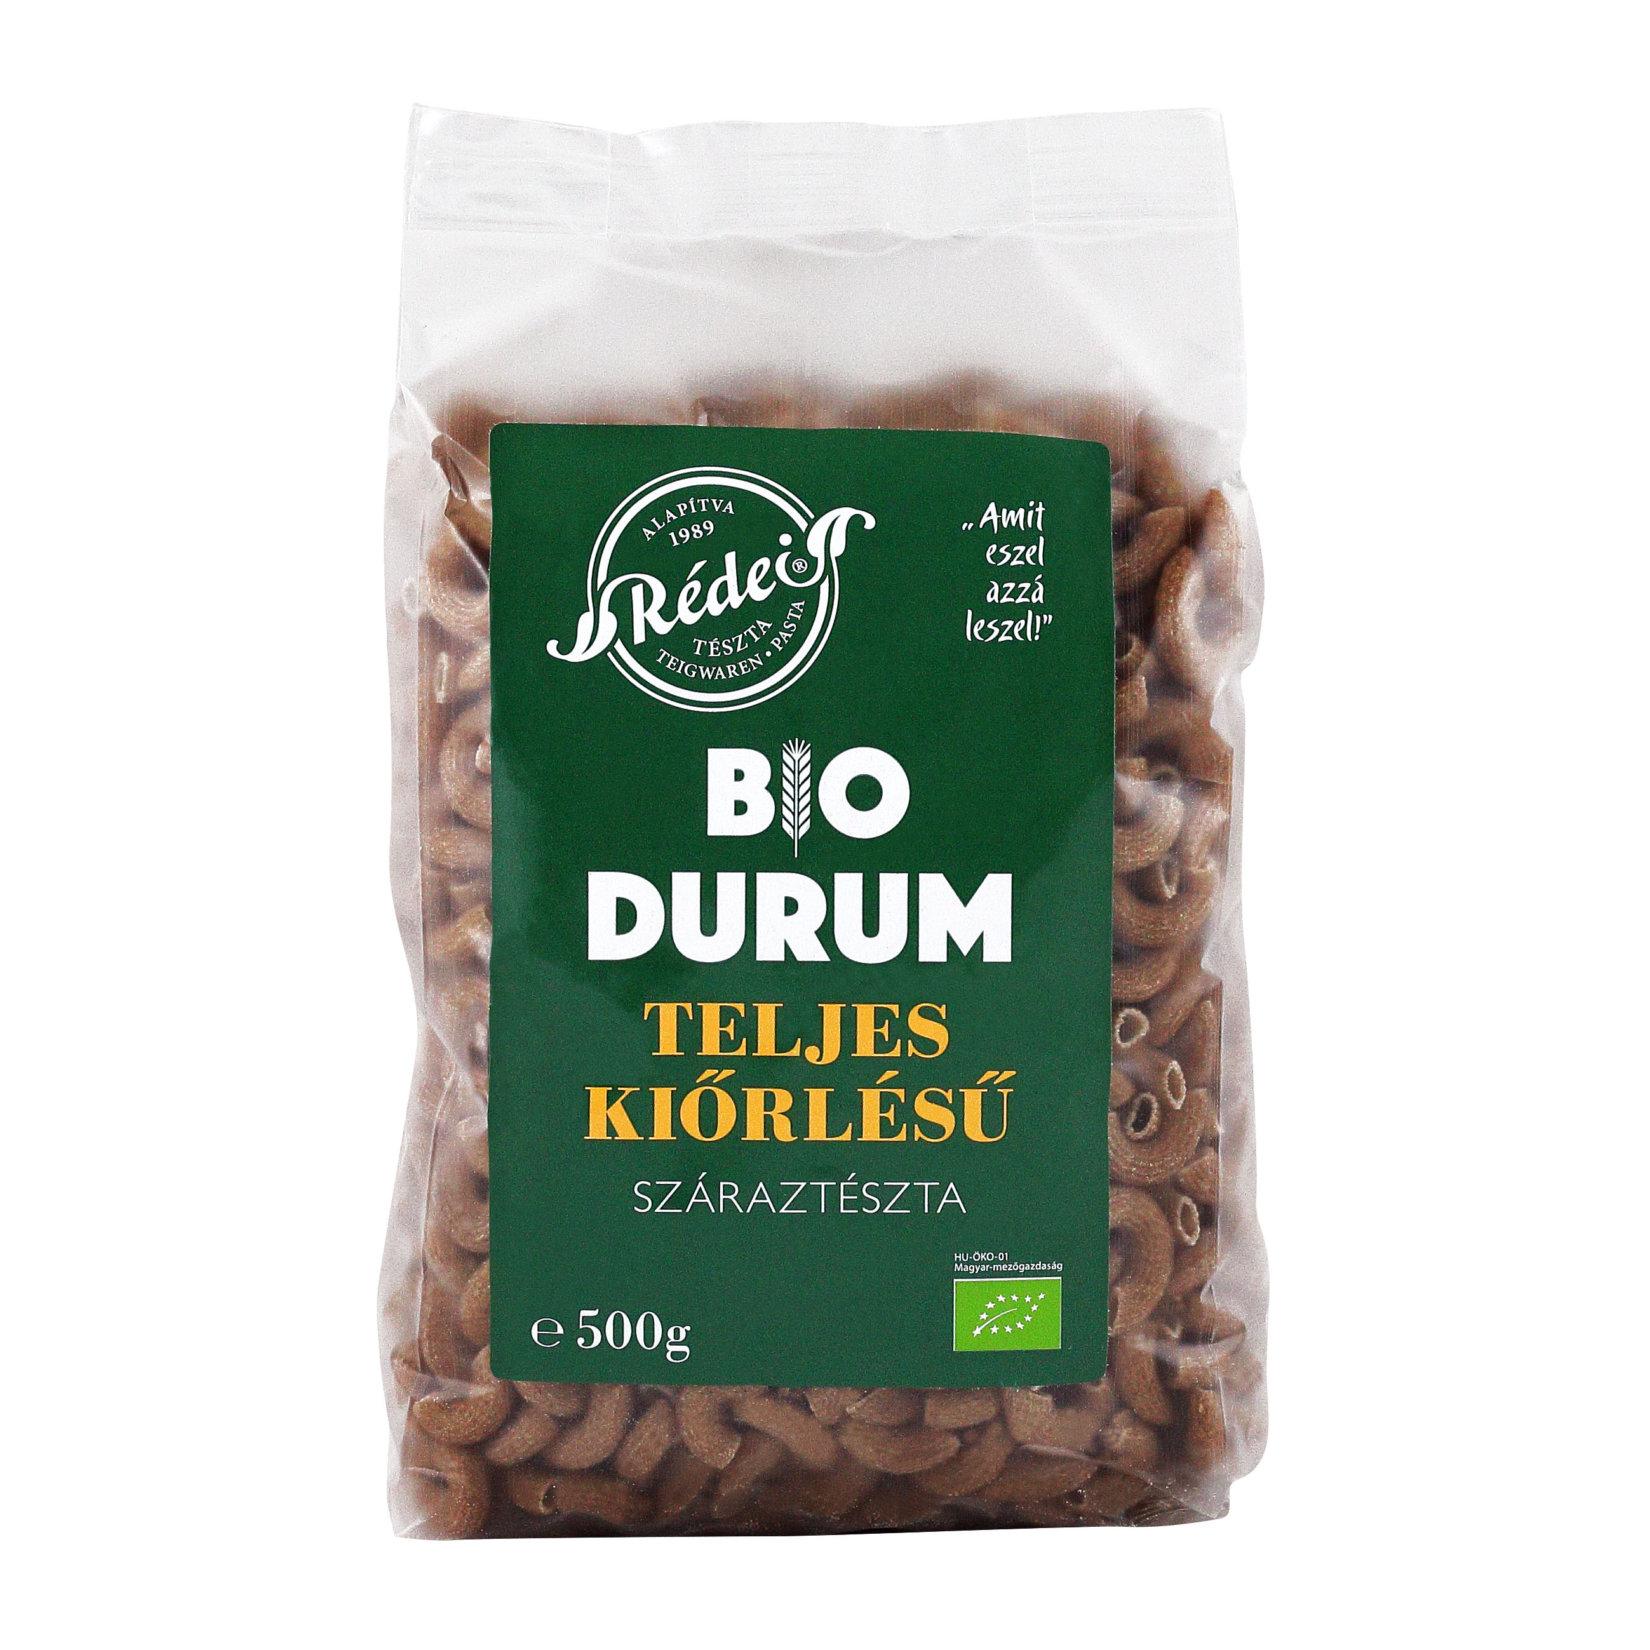 BioDurum_TK_szarvacksa_500g_IMG_6992